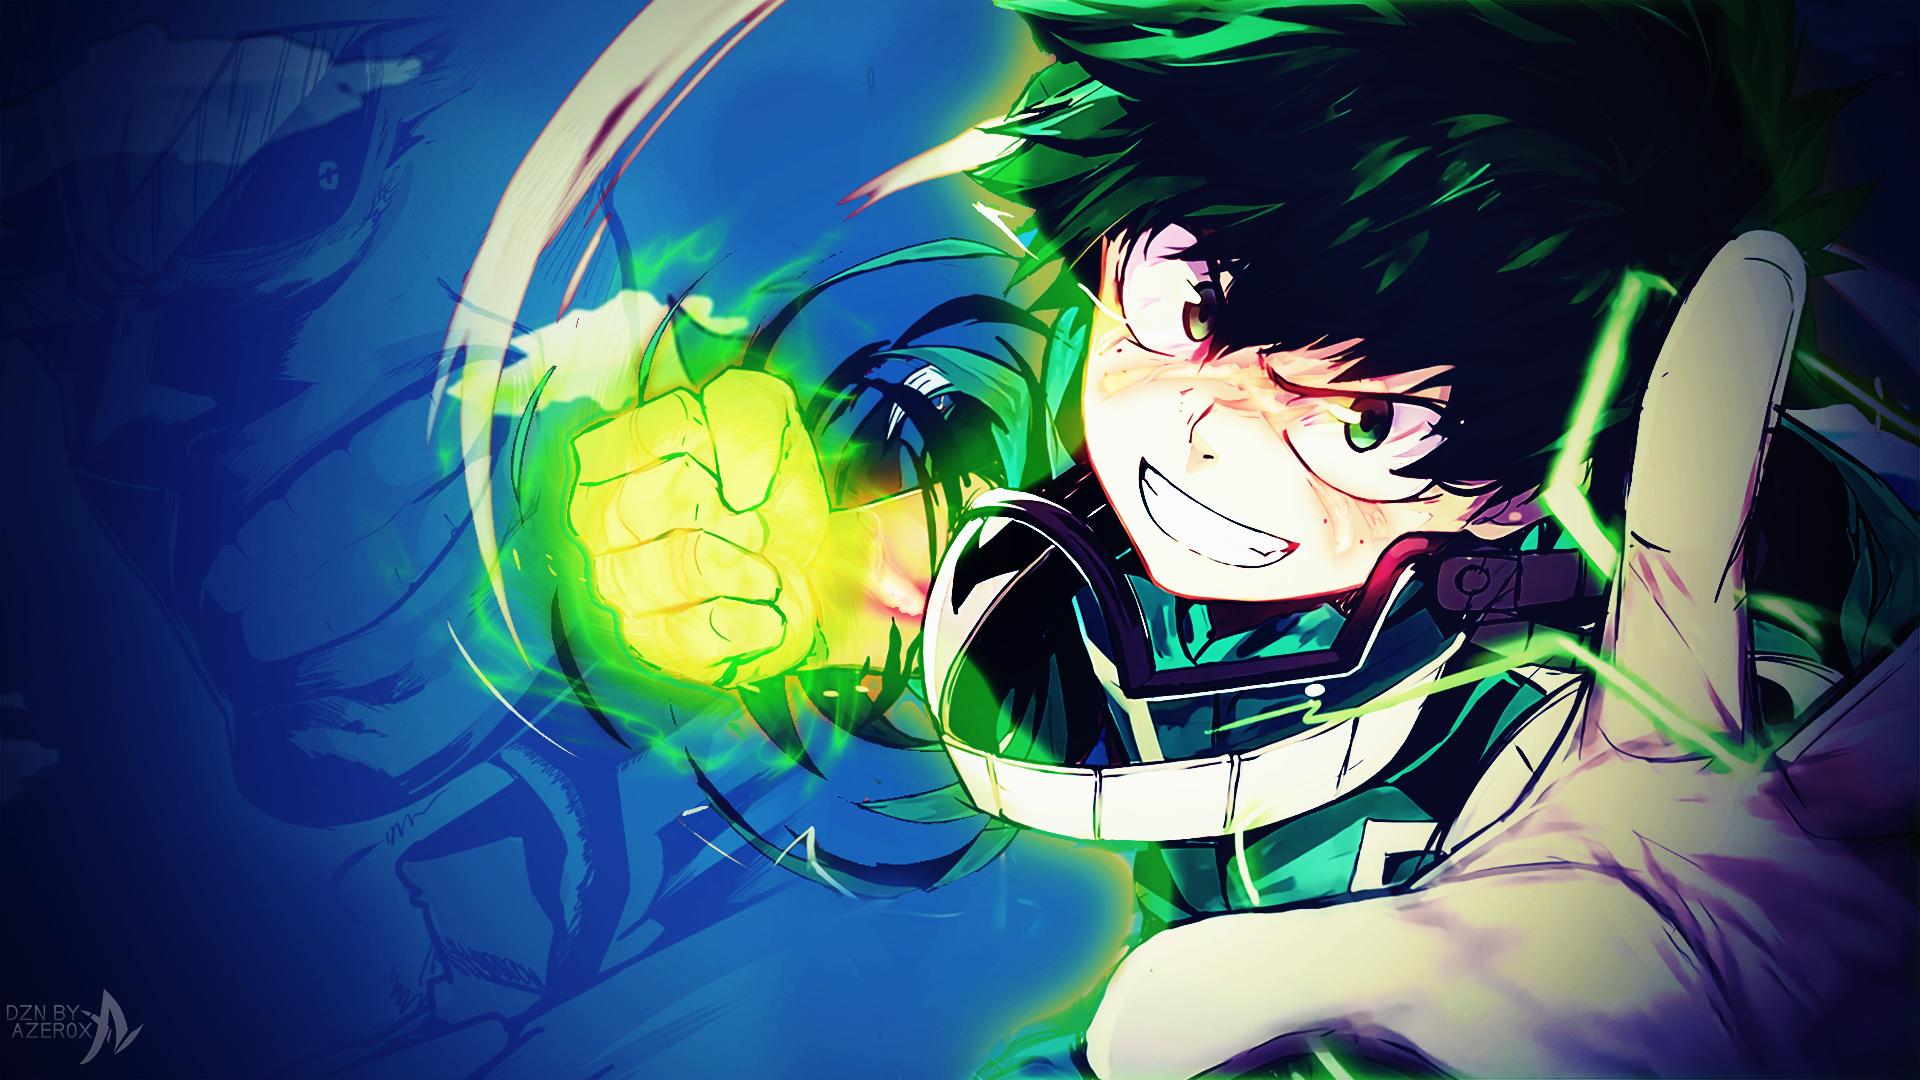 5000+ Wallpaper Anime Hd Boku No Hero Academia  Gratis